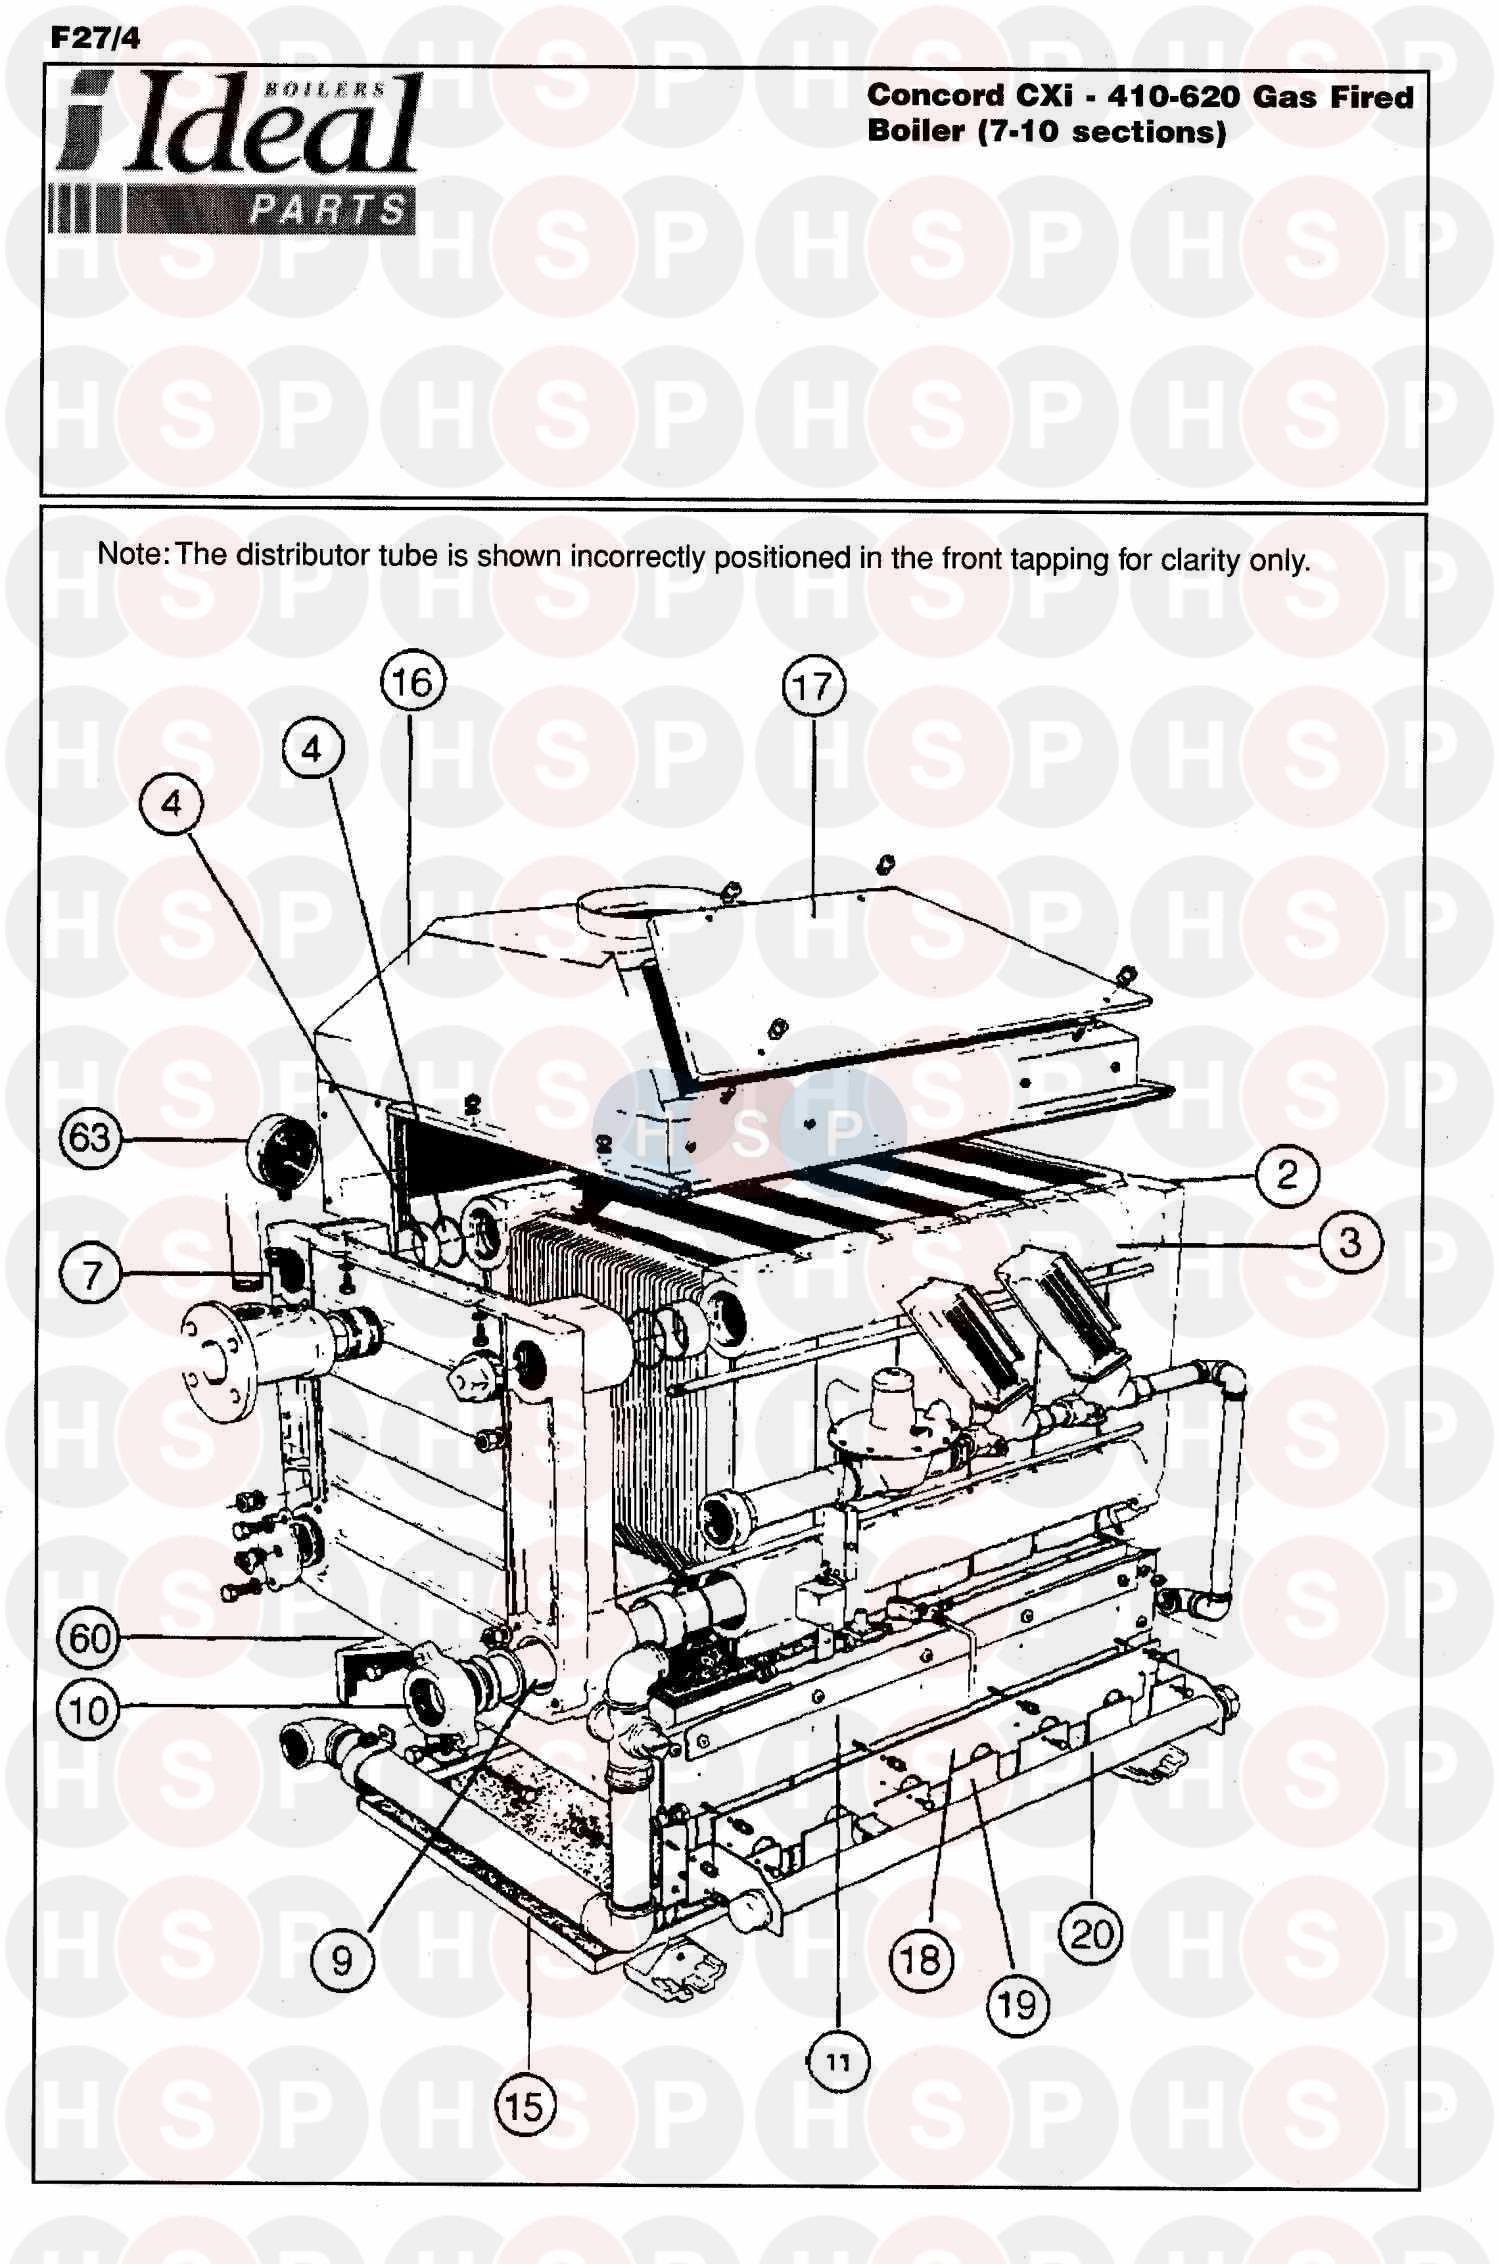 Famous Worcester Boiler Parts Diagram Inspiration - Wiring Diagram ...